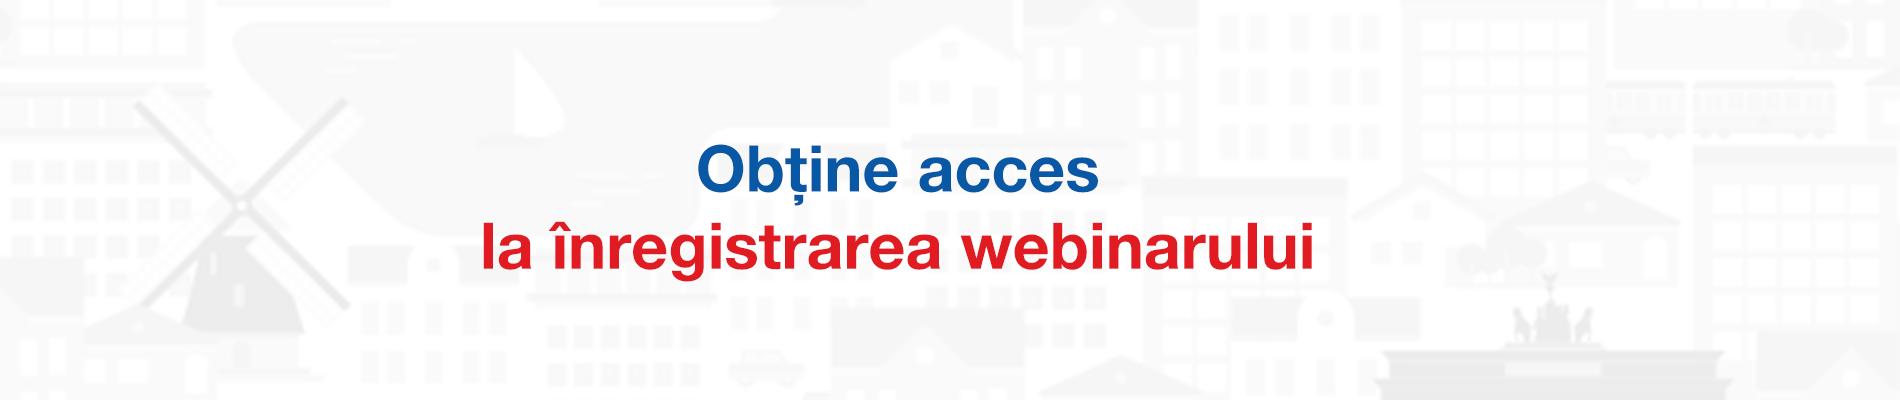 cta-acces-webinar